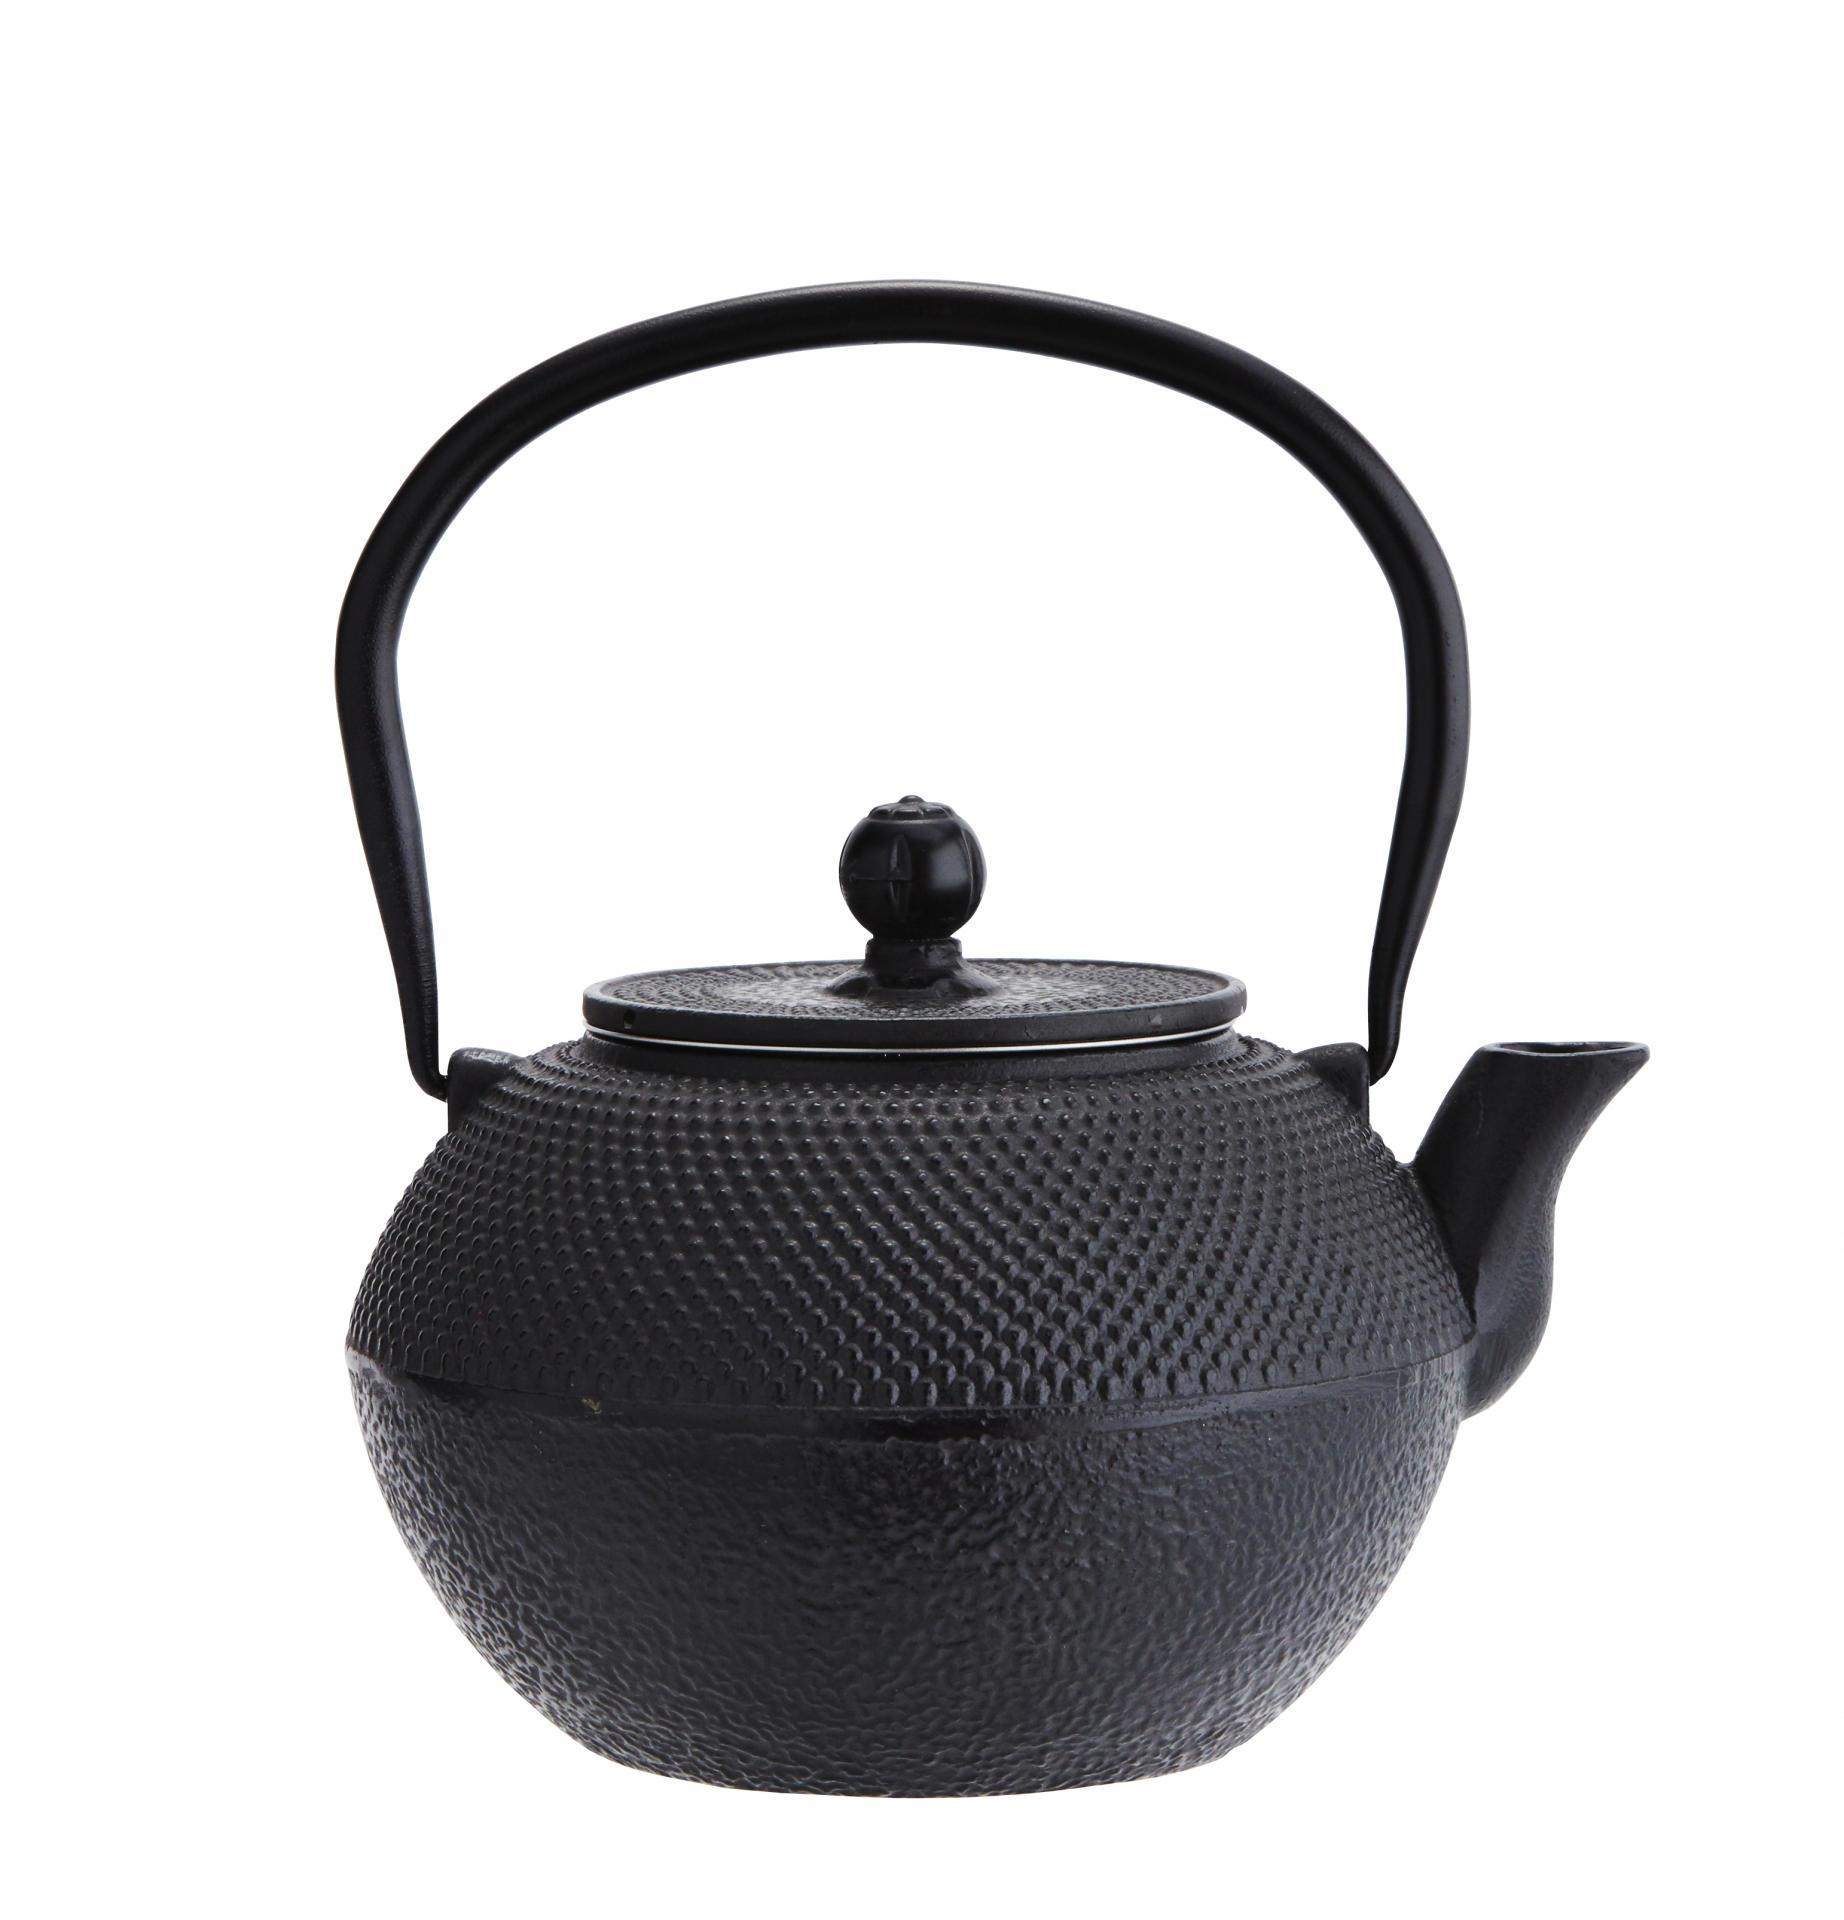 Madam Stoltz Litinová čajová konvice Black 1,2 l, černá barva, litina